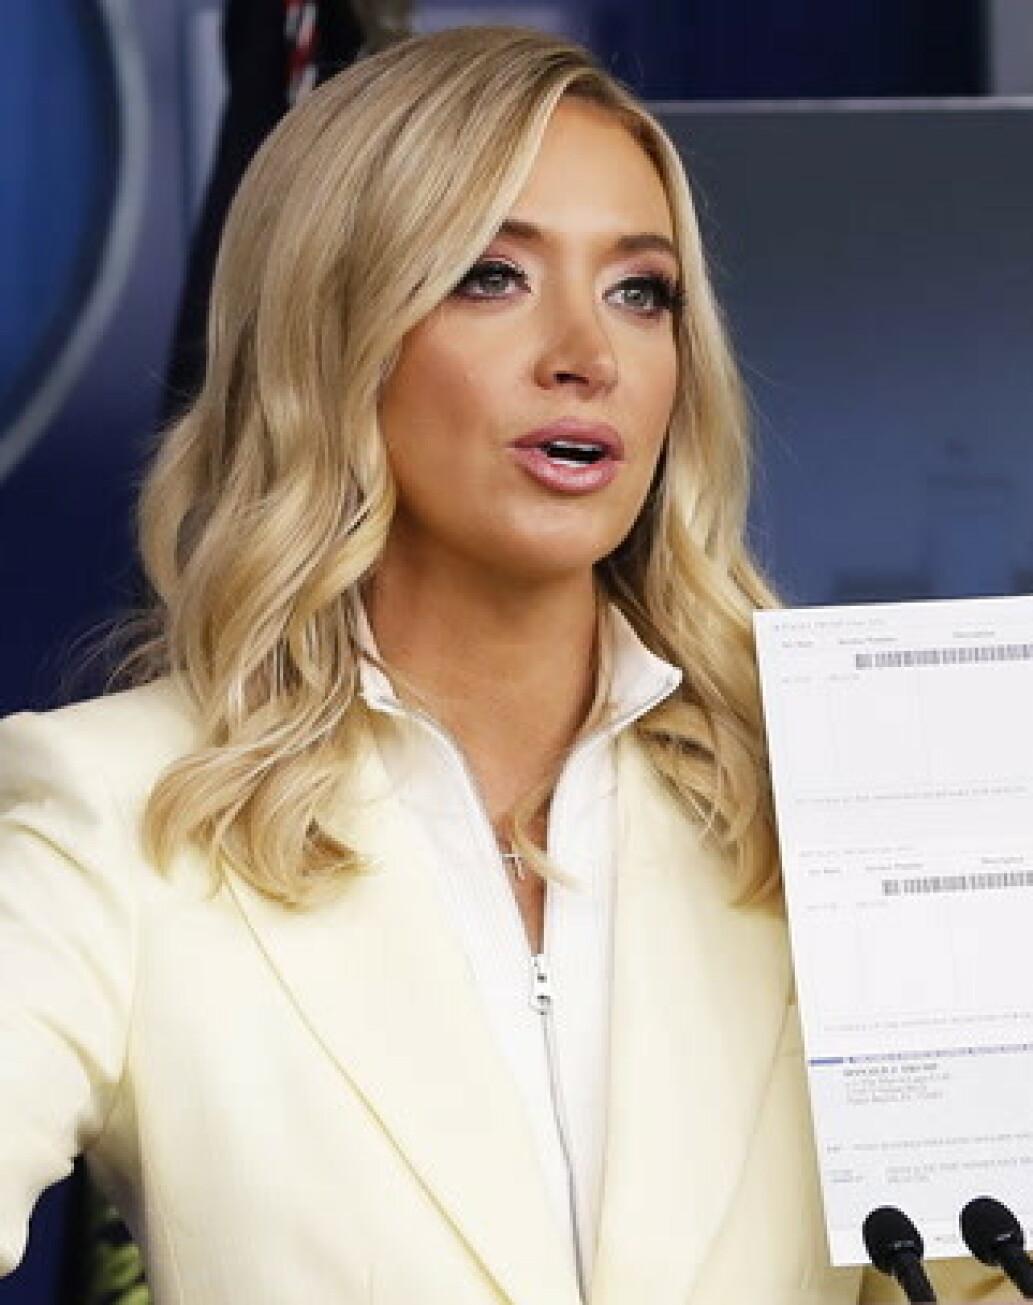 Trumps talskvinne med brøler på pressemøtet